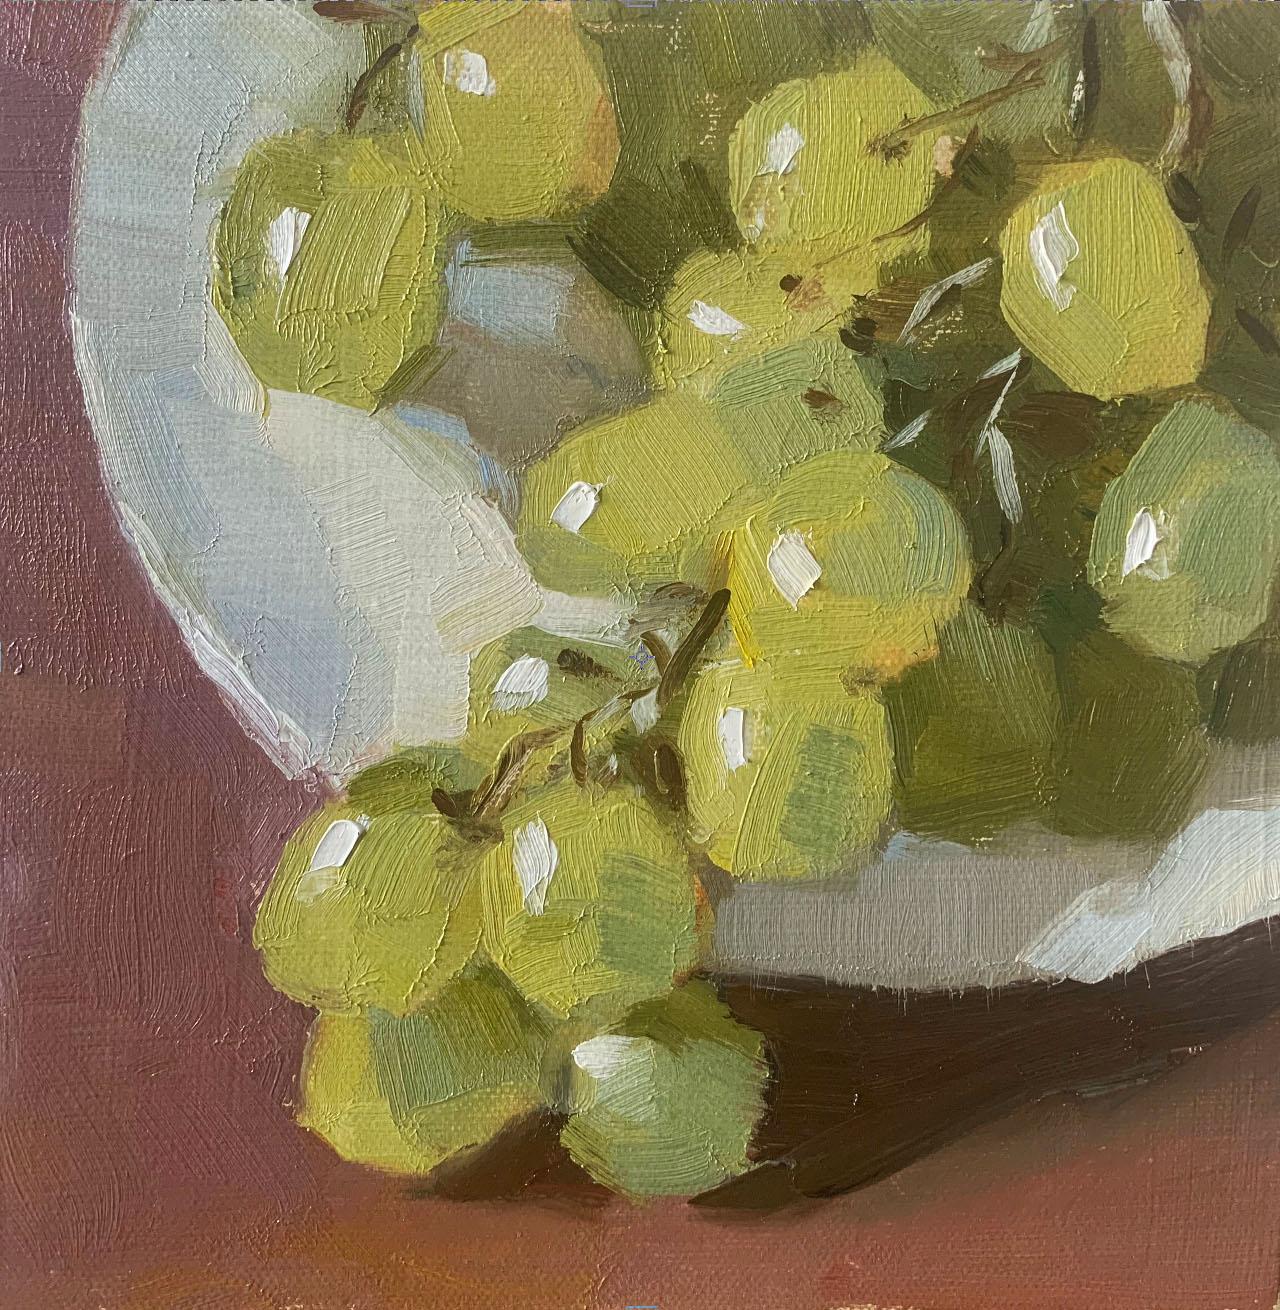 Grapes. 2019